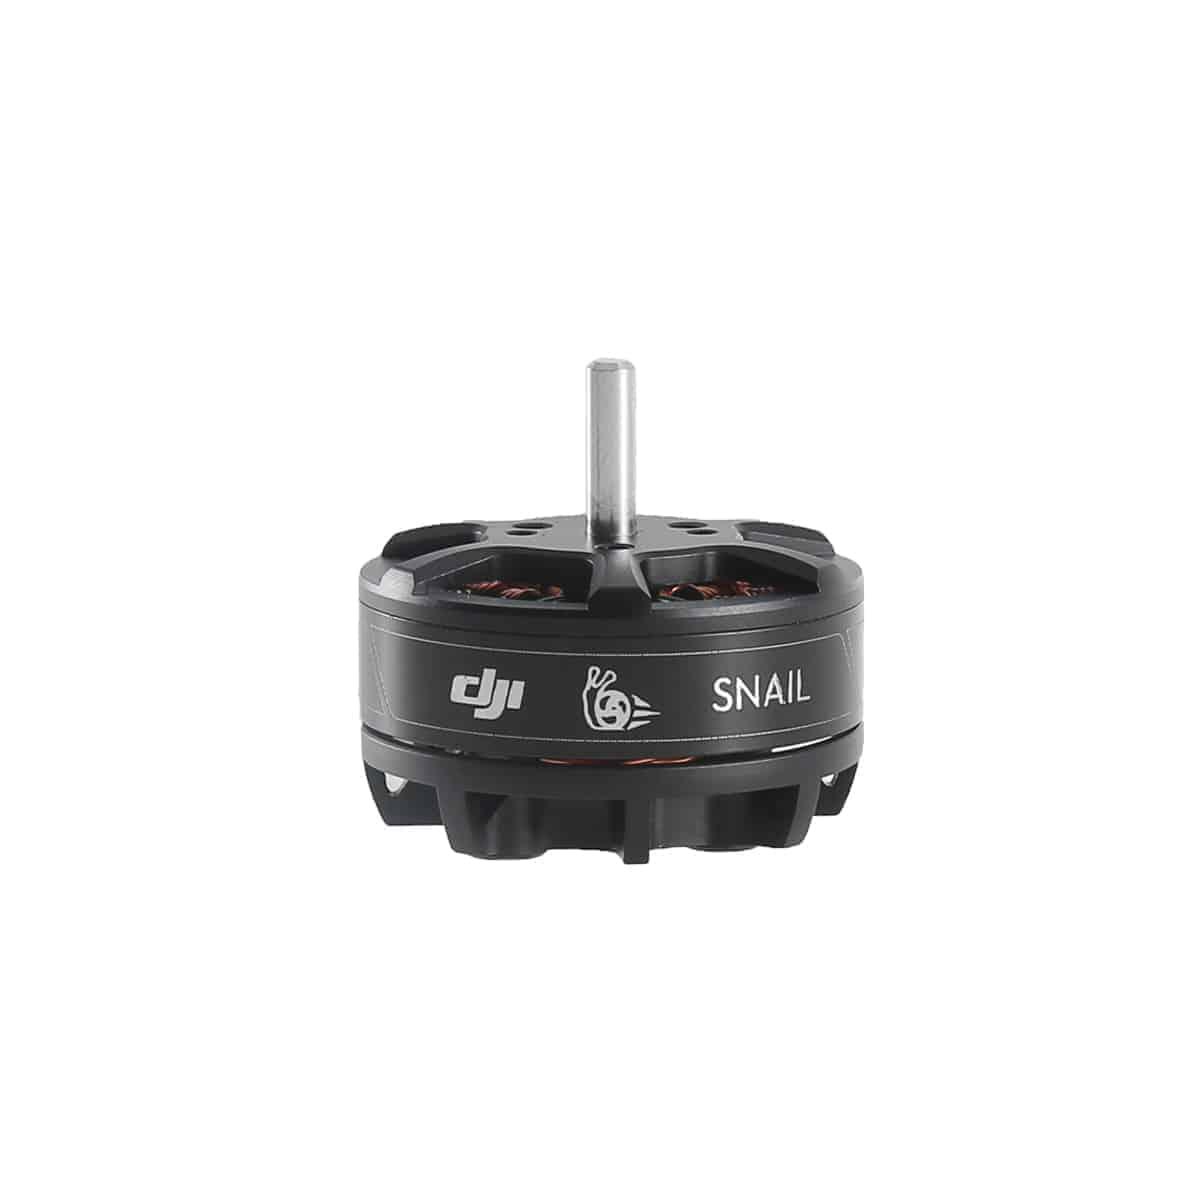 DJI Snail - 2305 Racing Motor